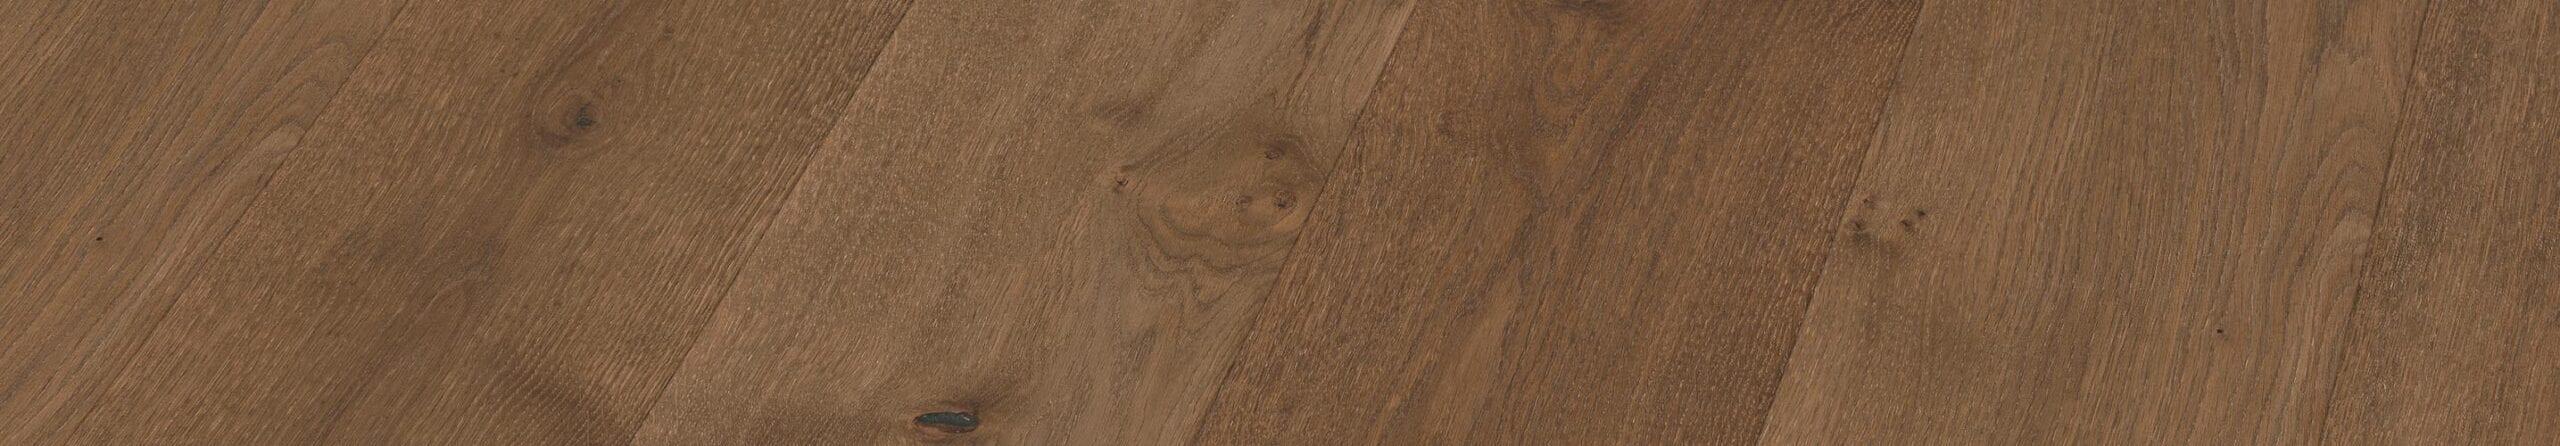 Montserrat-Island Collection-European Oak Floors-banner